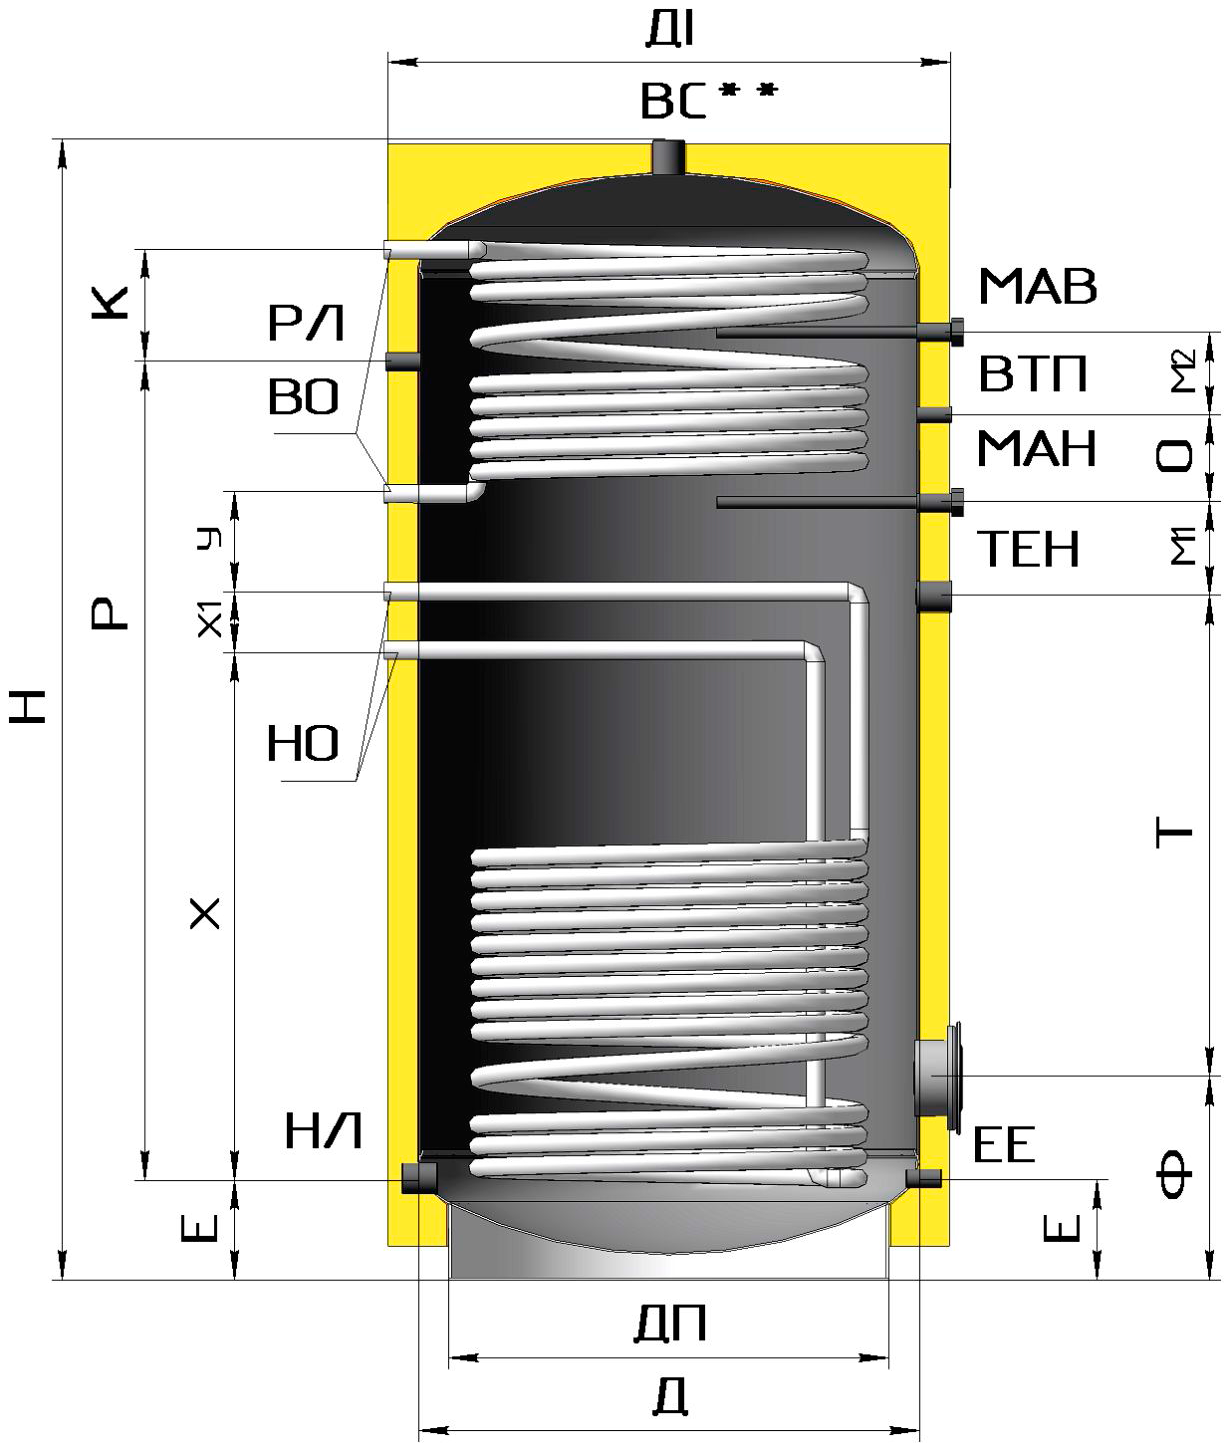 гвс схема обвязки баков аккумуляторов